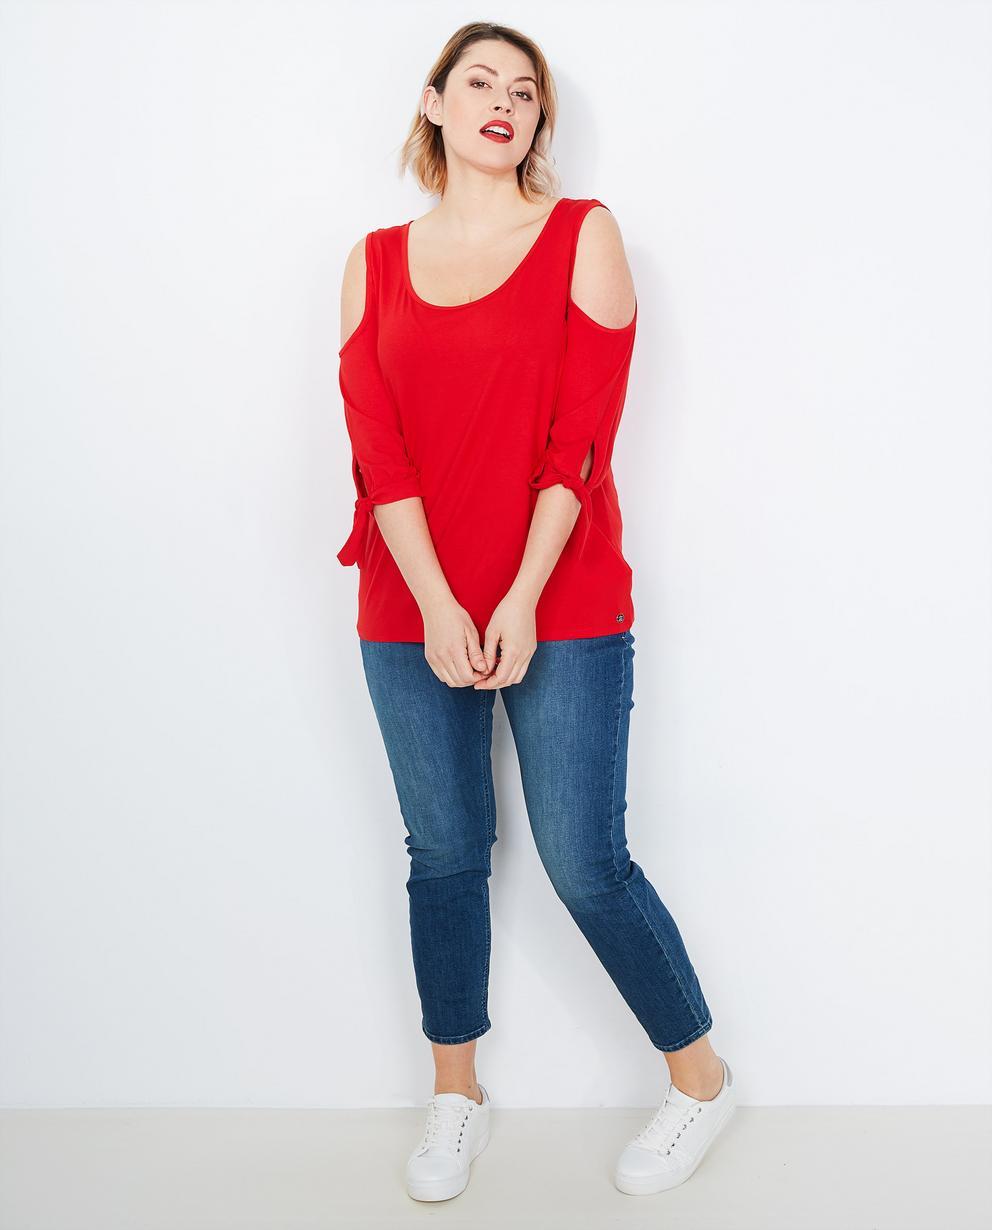 1165606735b60a Vuurrode blouse - met cutouts - Lena Lena